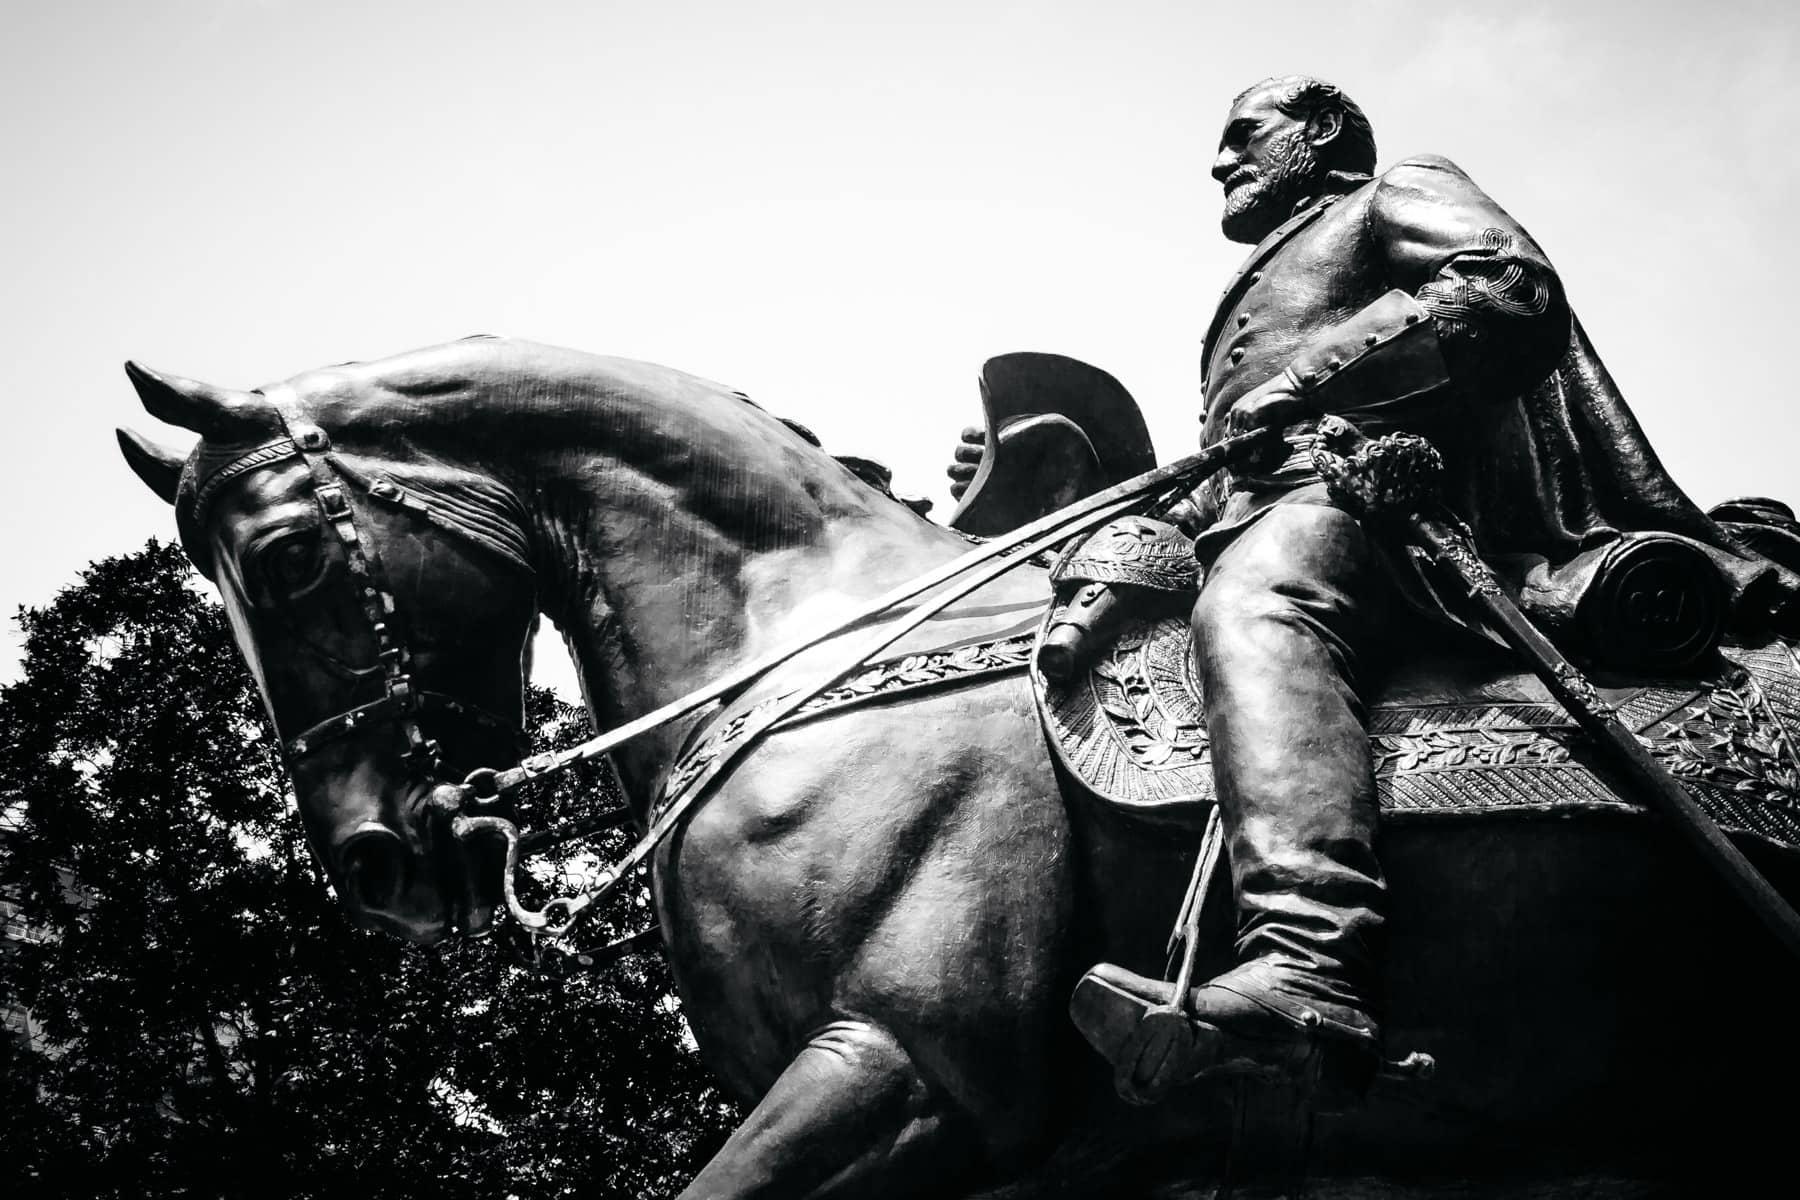 A statue of Confederate General Robert E. Lee in Dallas' Lee Park.